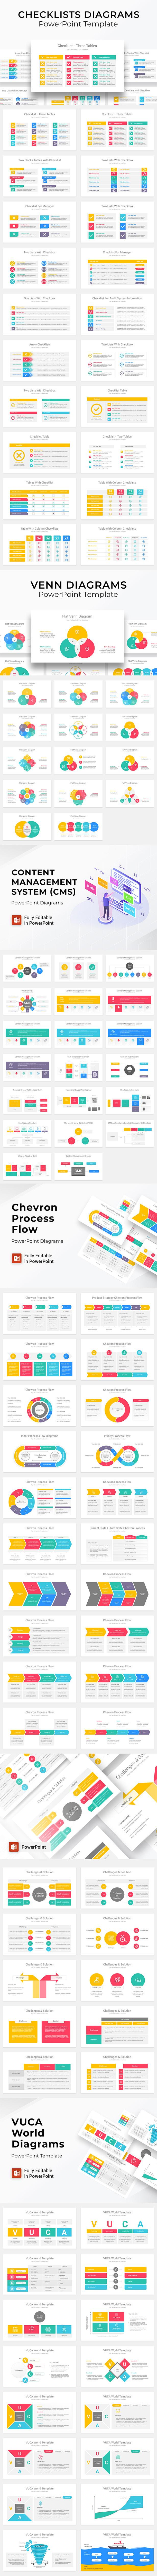 Slide Deck - Multipurpose PowerPoint Template - 7